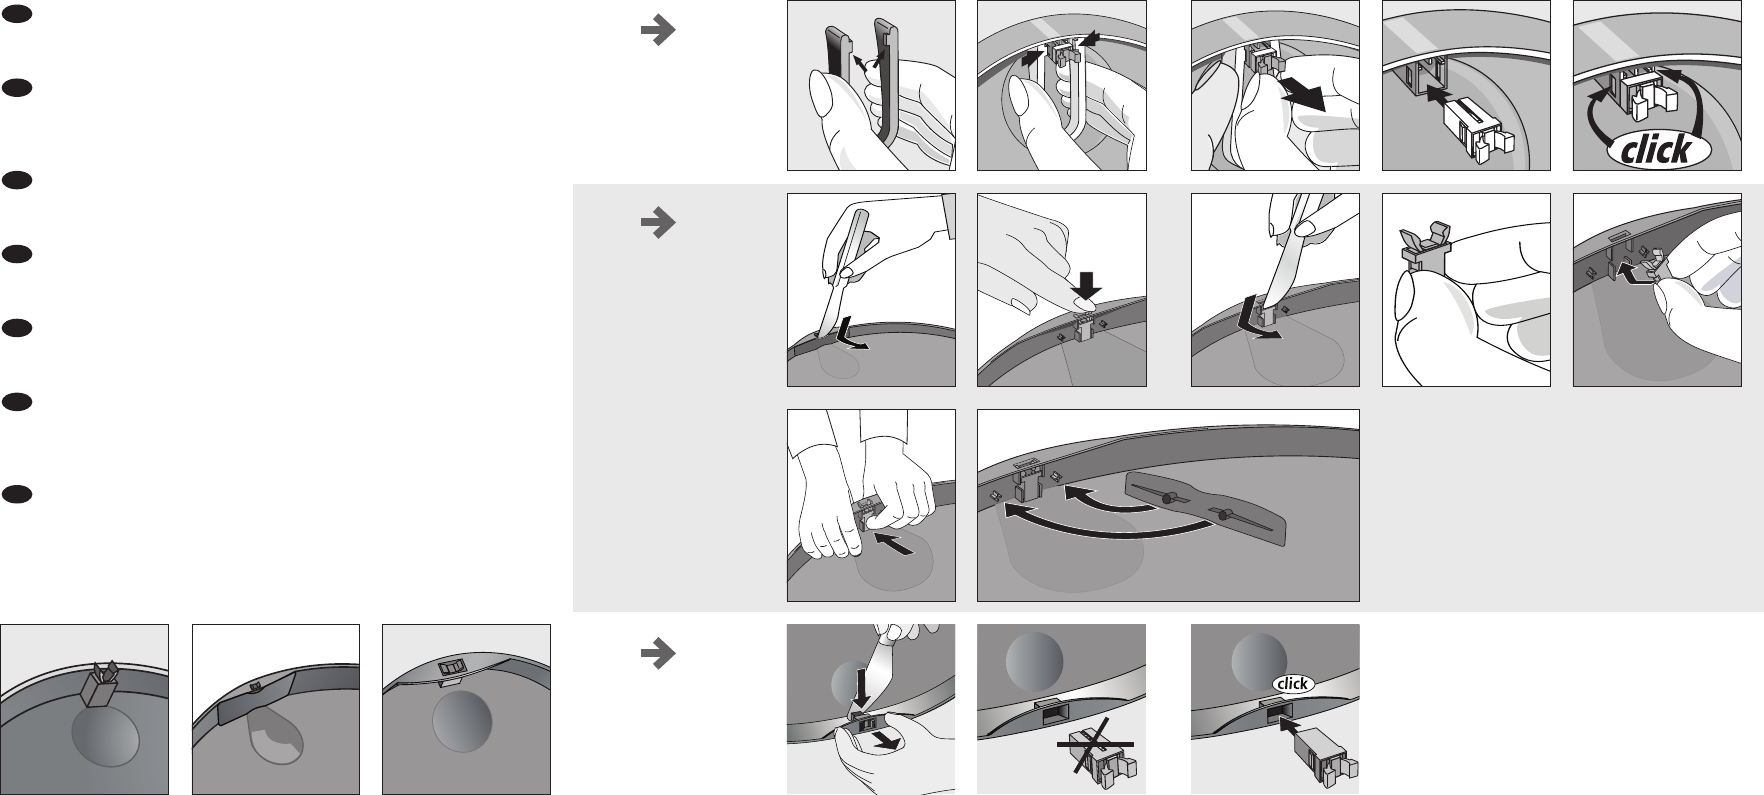 Touch Bin Sluiting.Handleiding Brabantia Touch Bin Pagina 2 Van 2 Deutsch